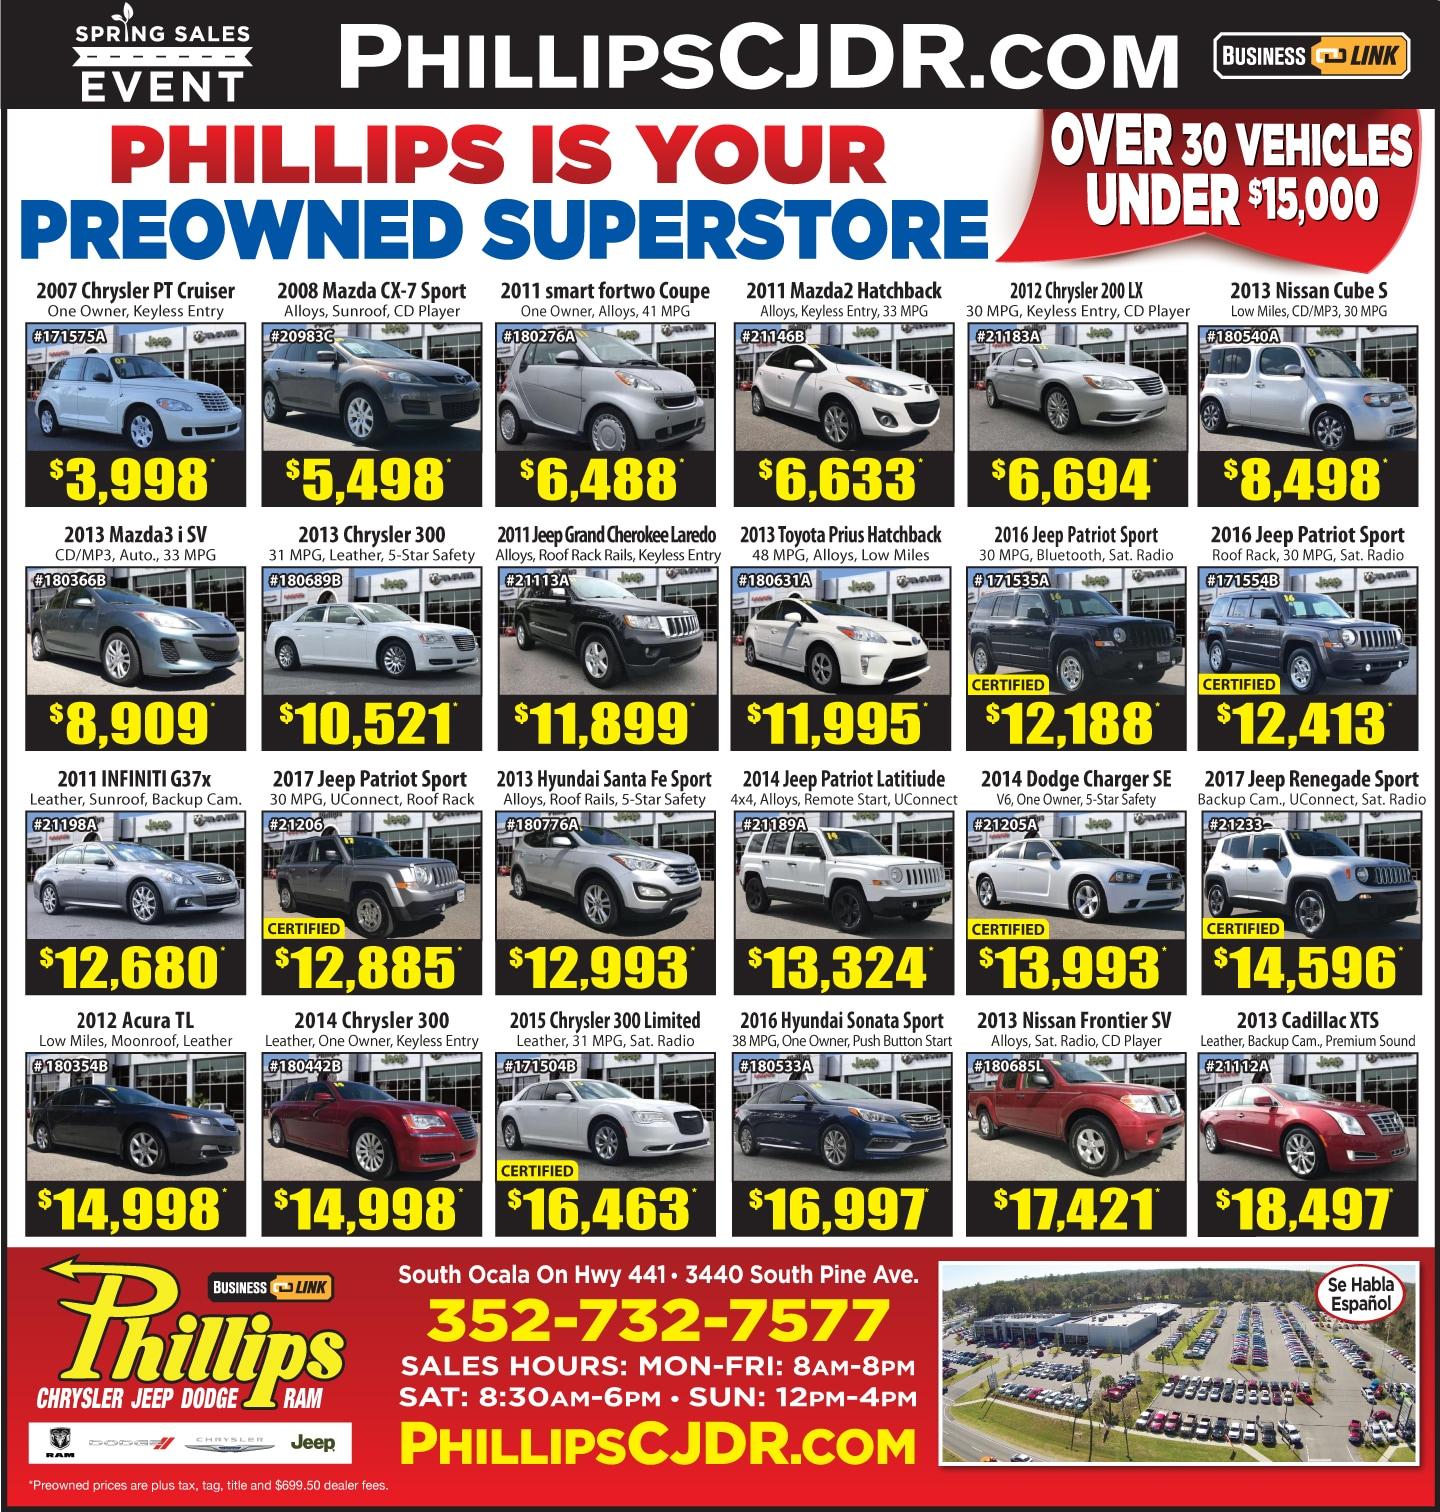 Phillips Chrysler Jeep Dodge Ram | New Chrysler, Jeep, Dodge, Ram ...